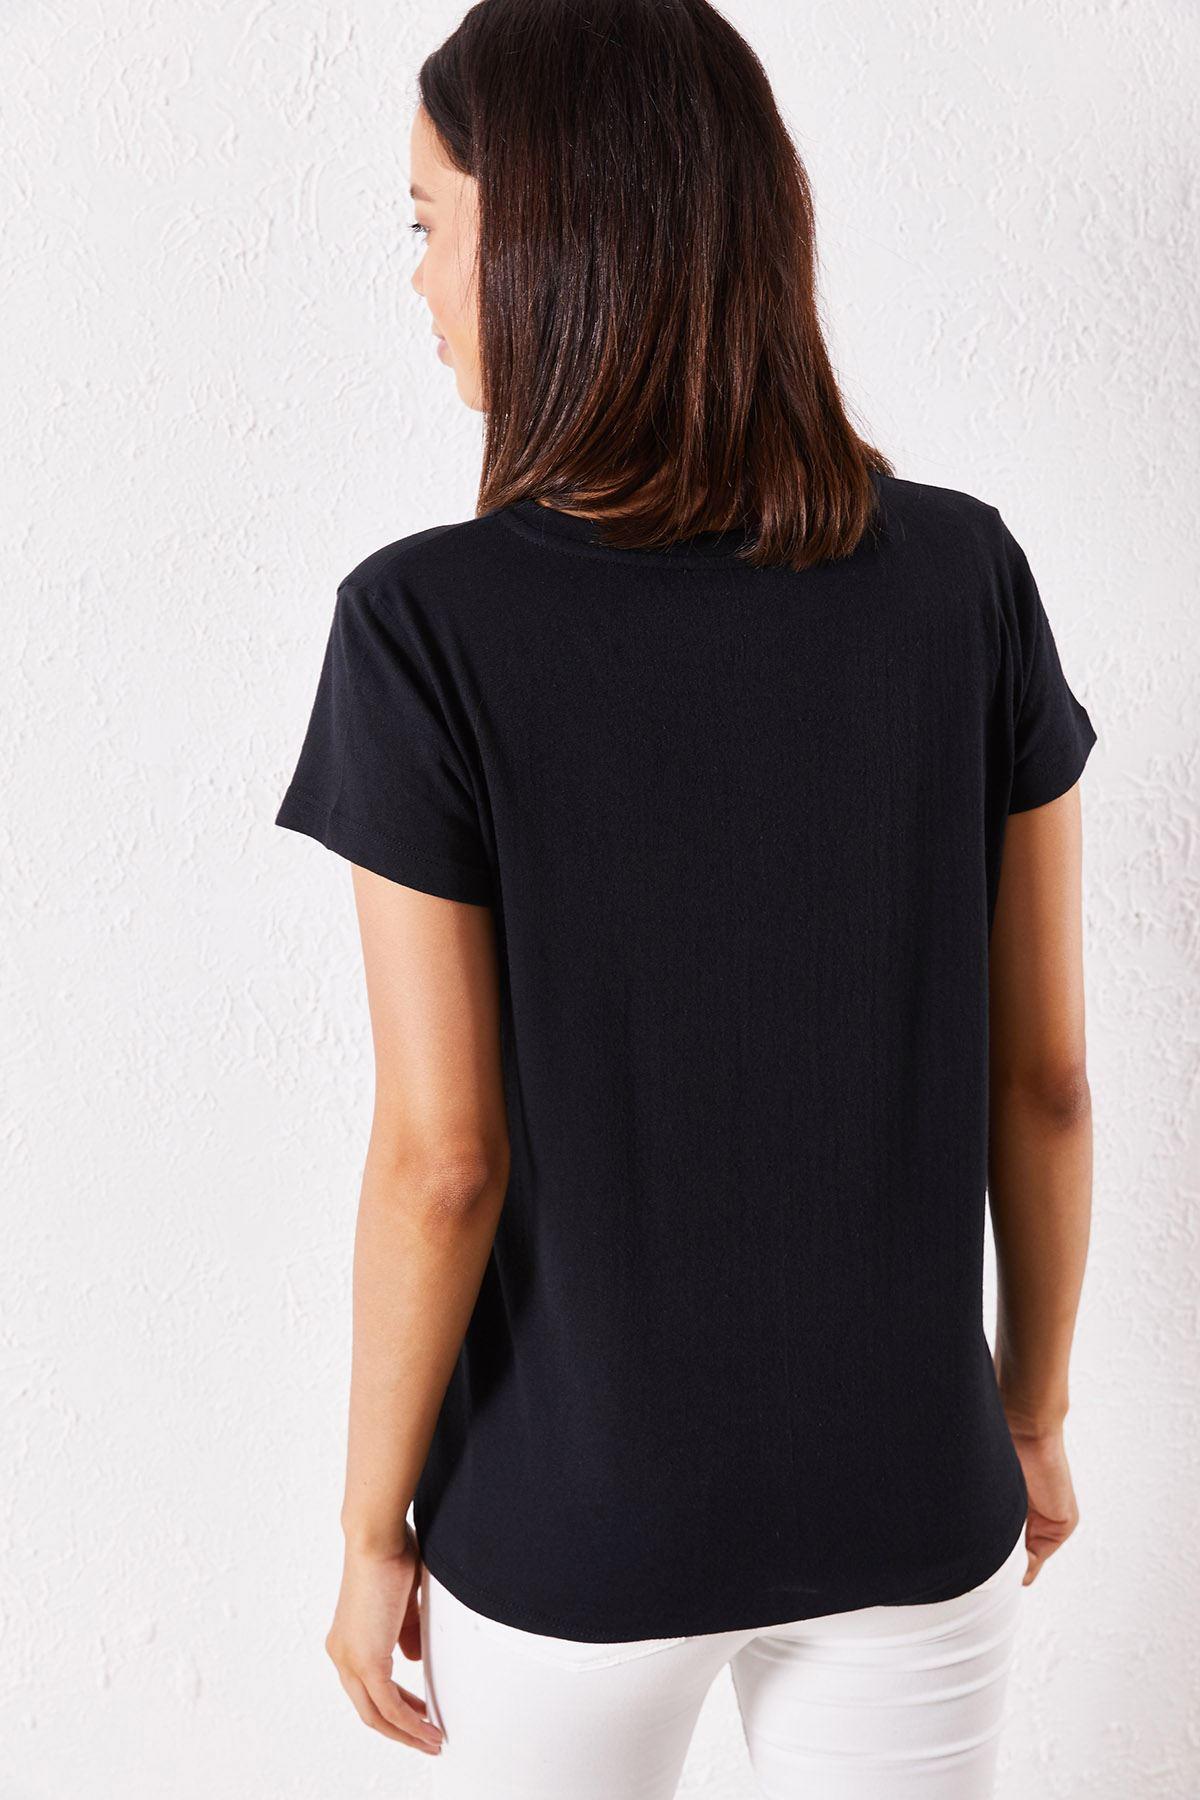 Kadın Eşli Mrs Rigbt Baskılı Siyah Tişört